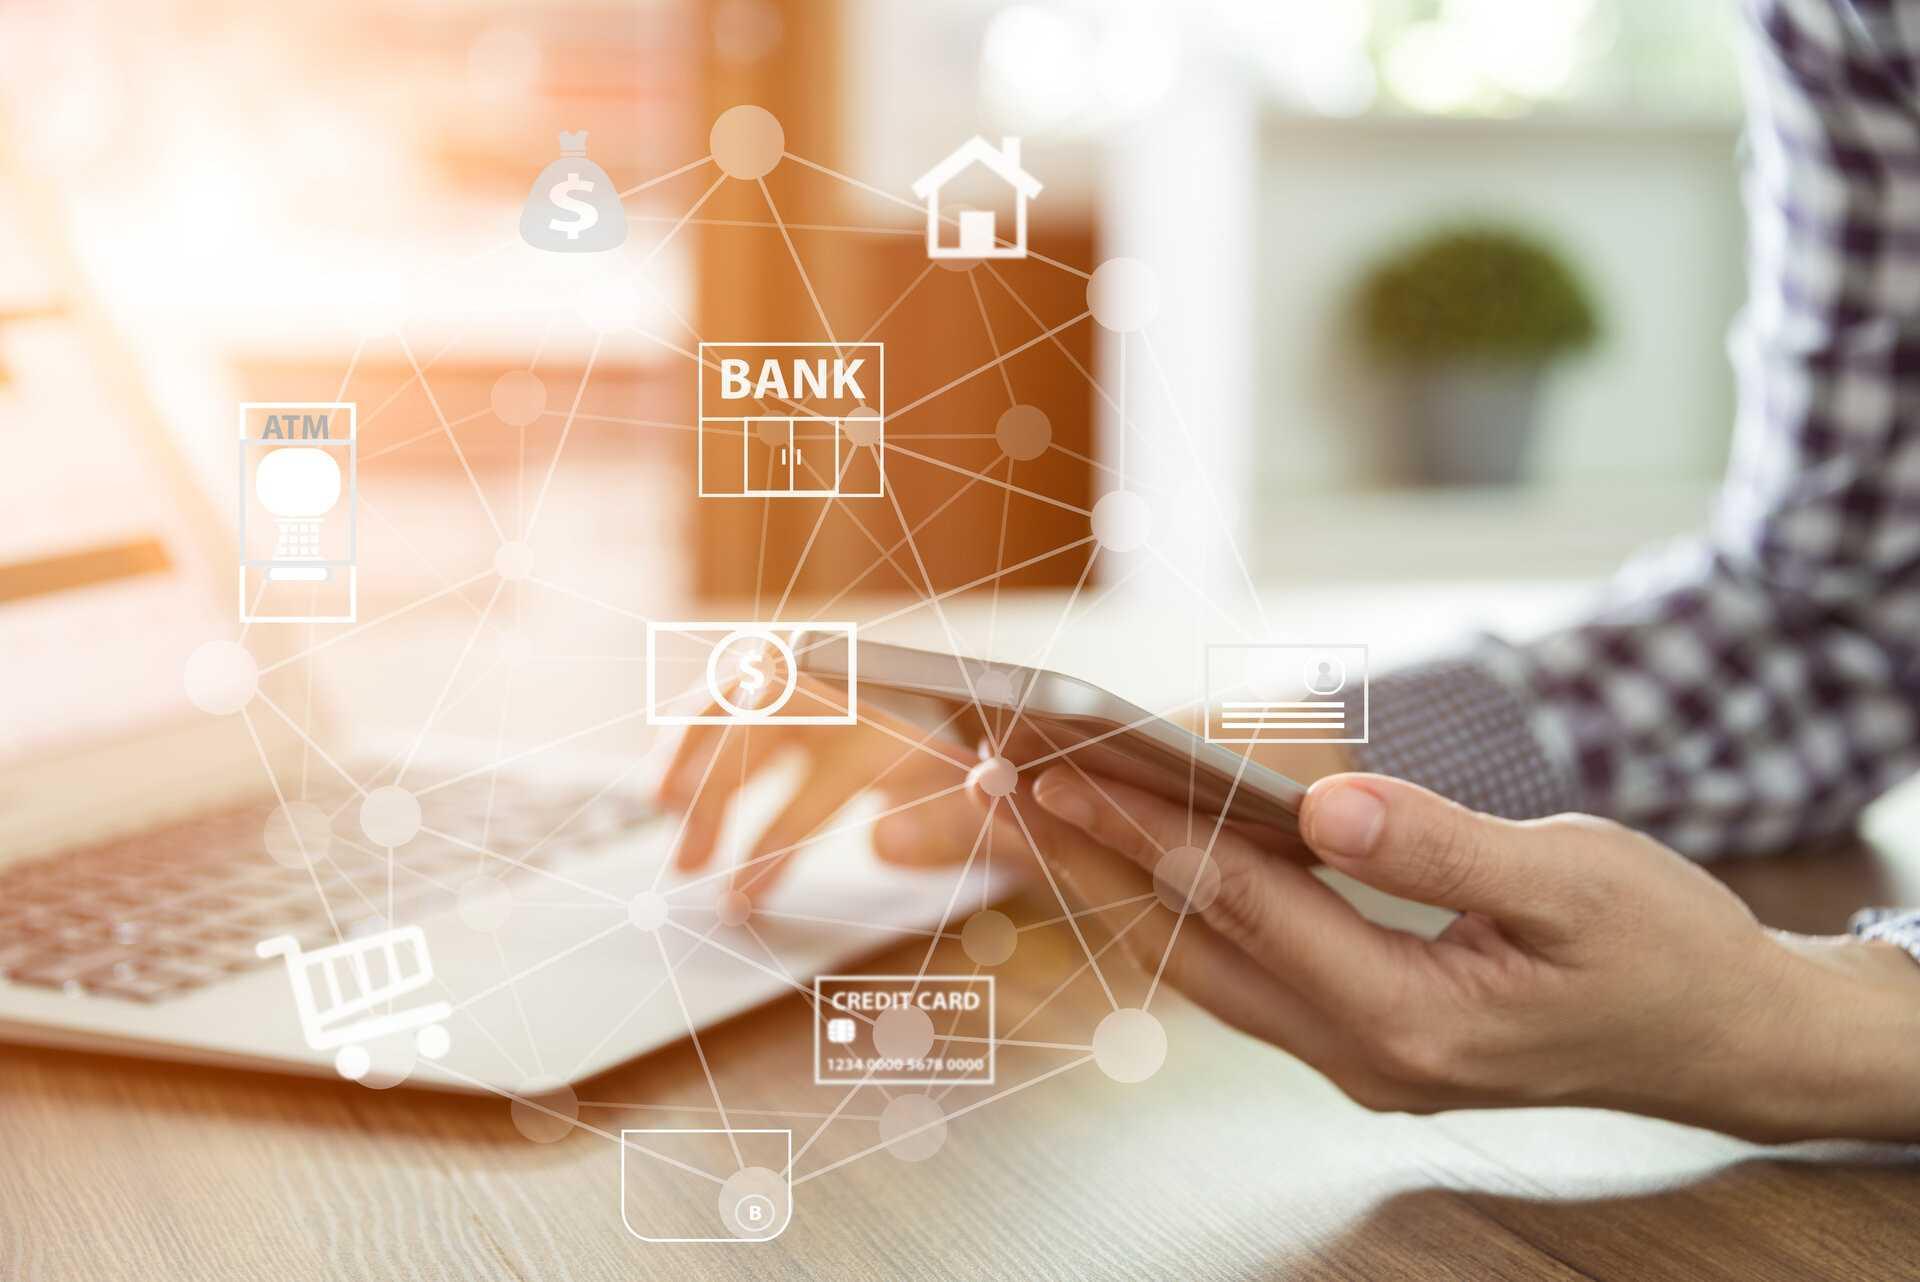 Online banking customer